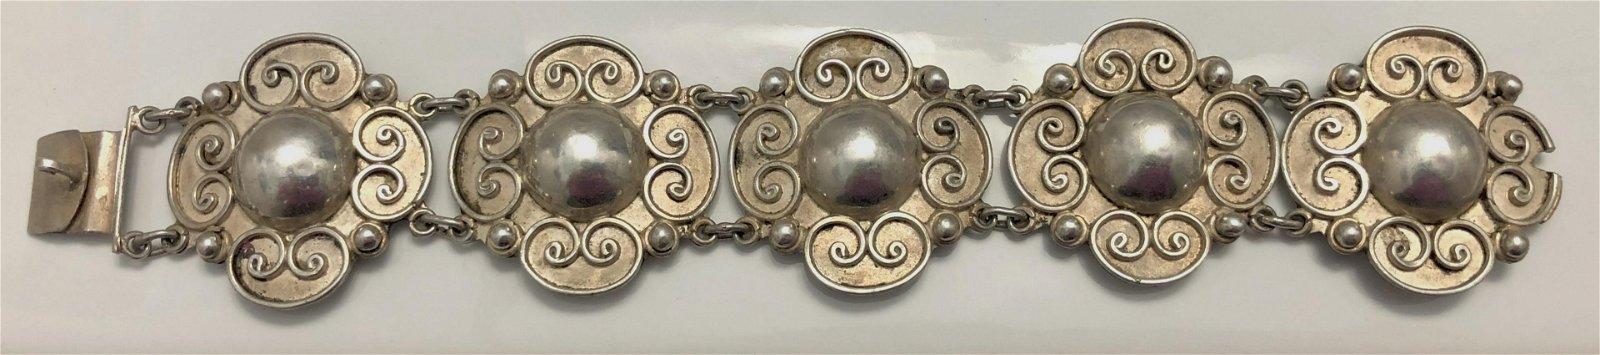 A Carmen Beckmann Sterling Silver Bracelet, 1960s